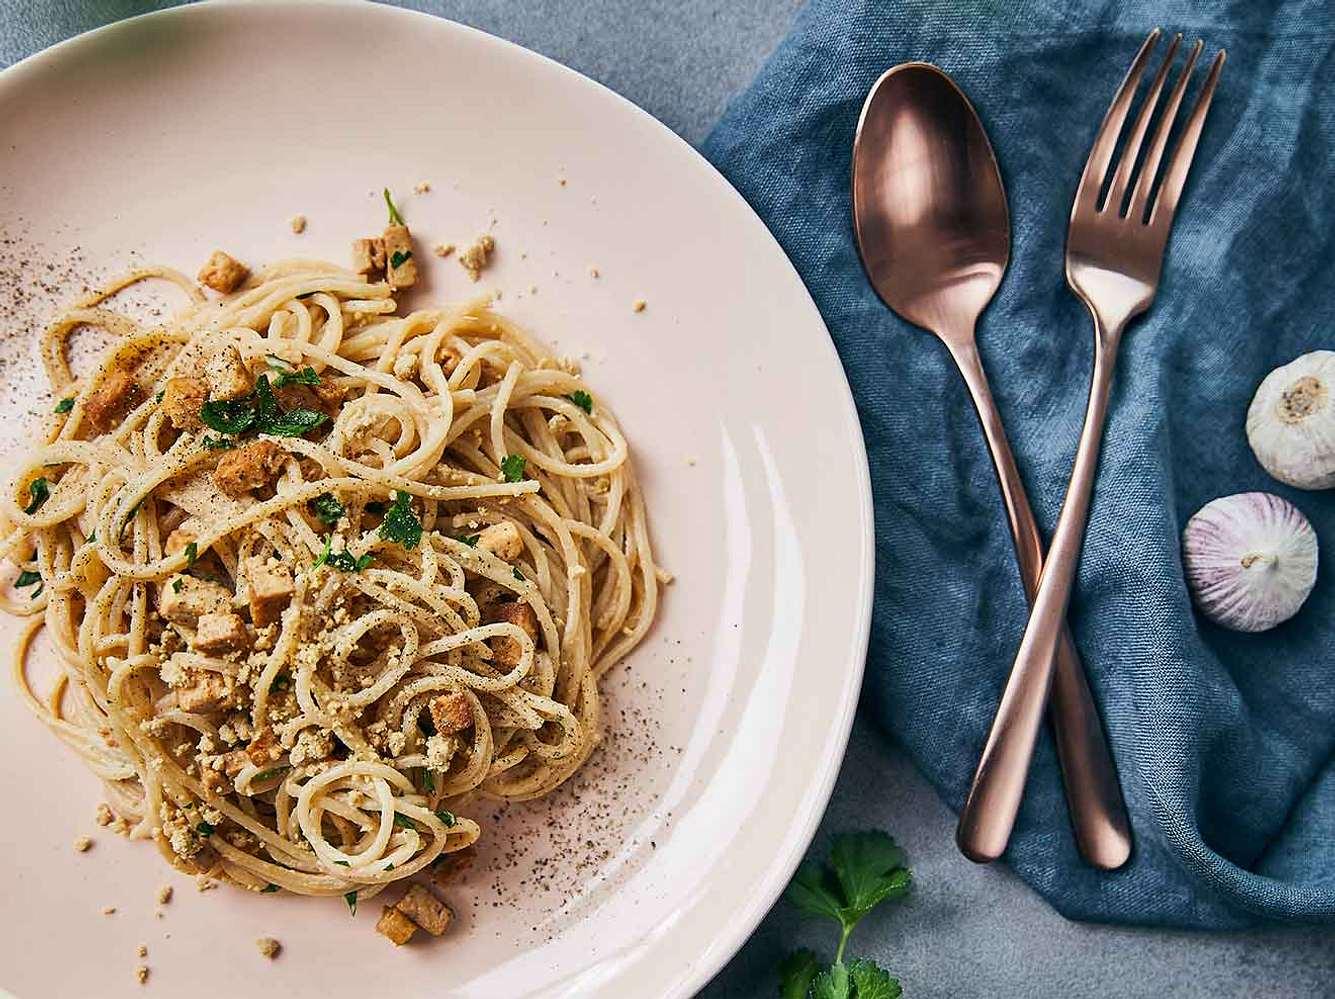 Vegane Pasta: Rezept für vegane Spaghetti Carbonara